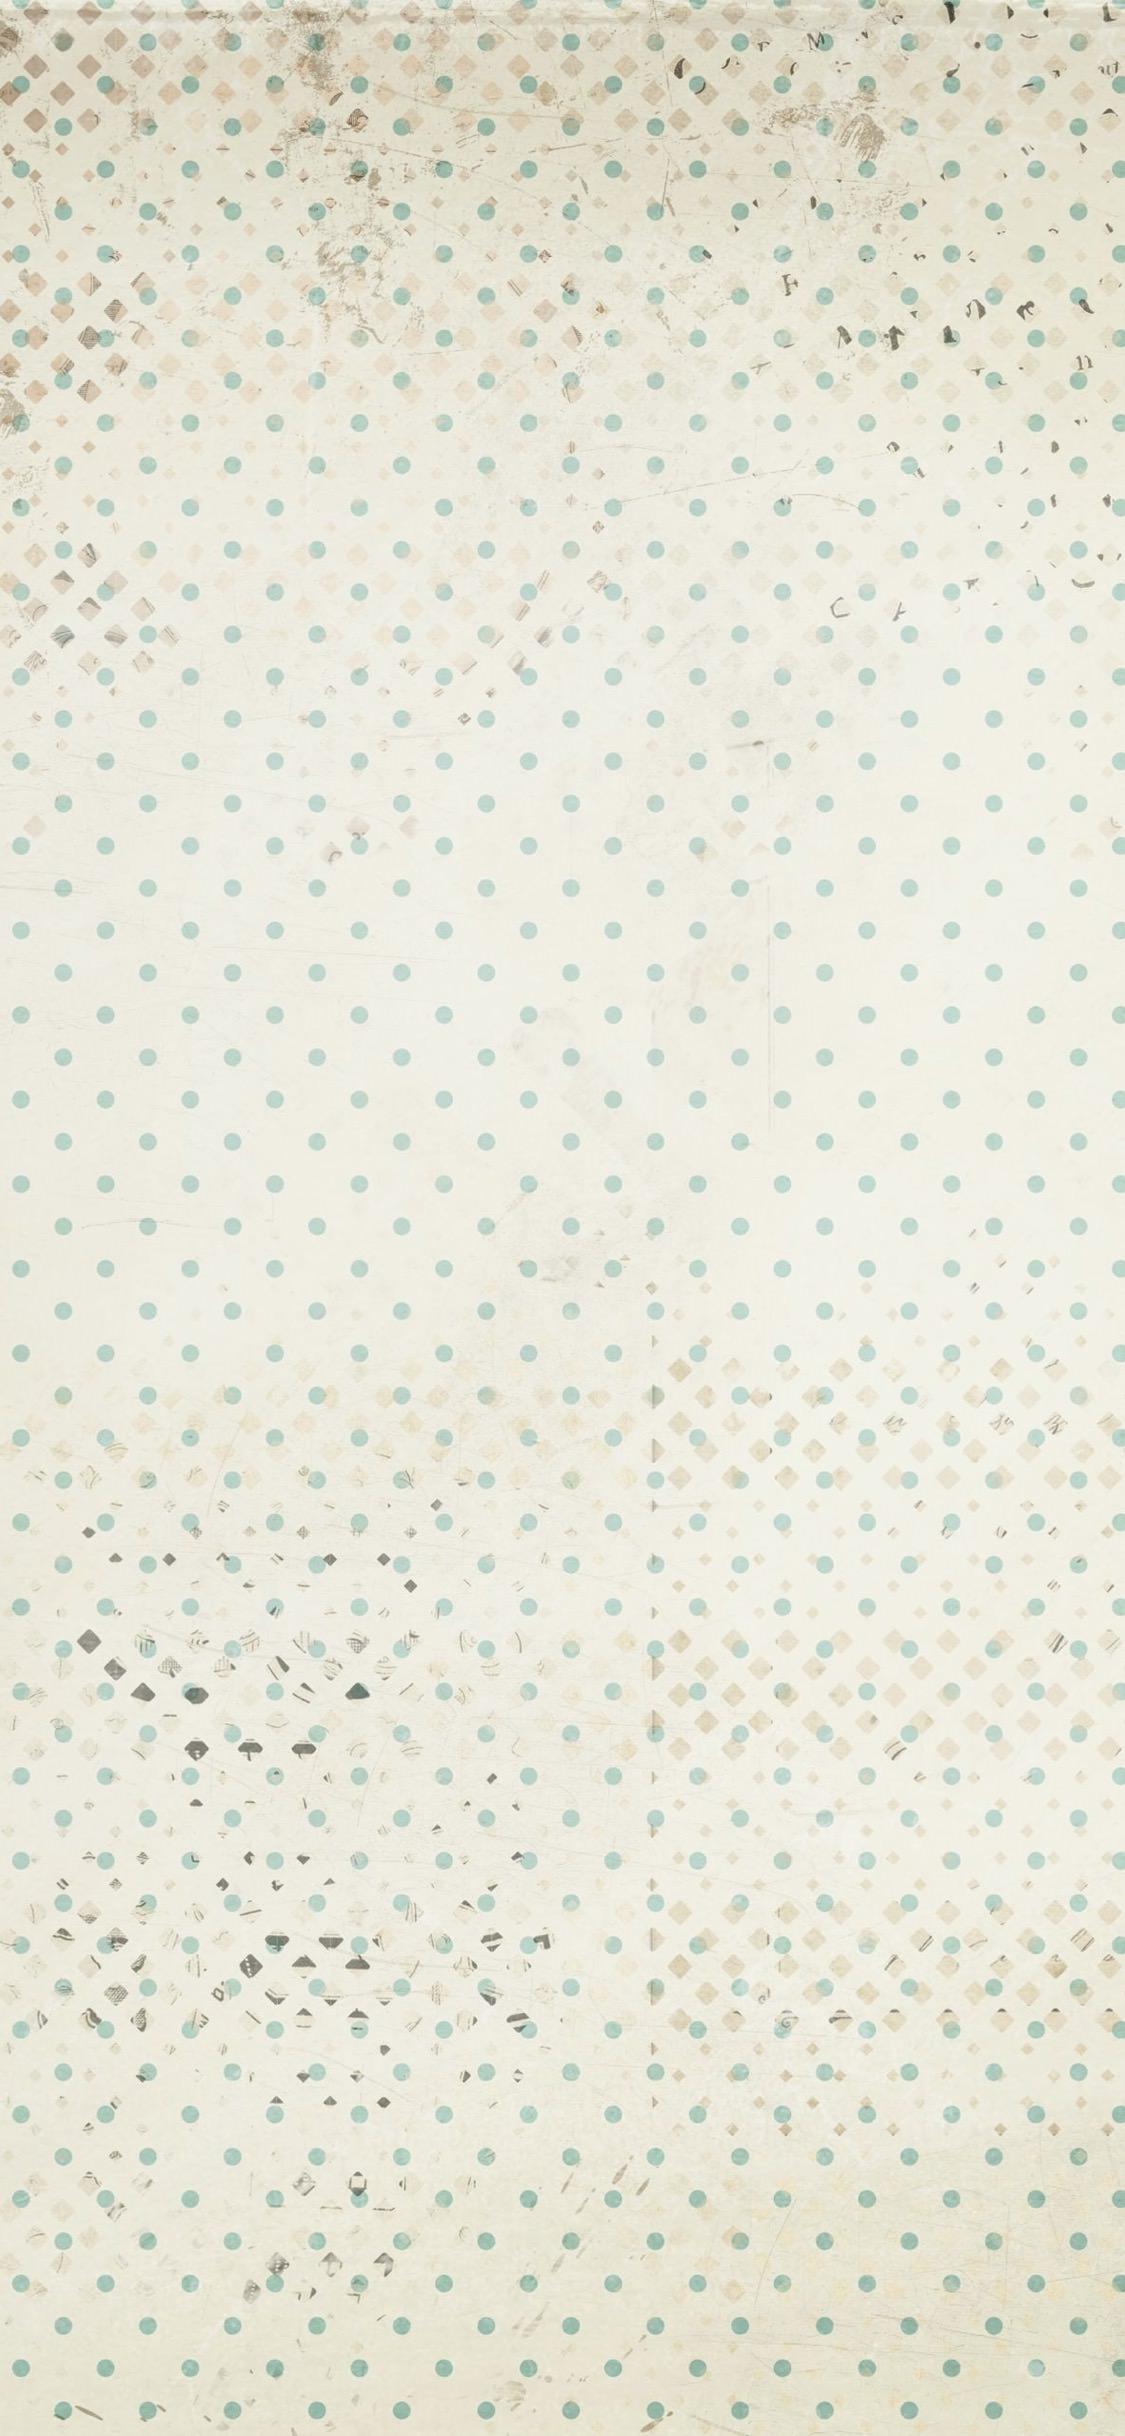 White Dots Wallpaper Sc Iphonexs